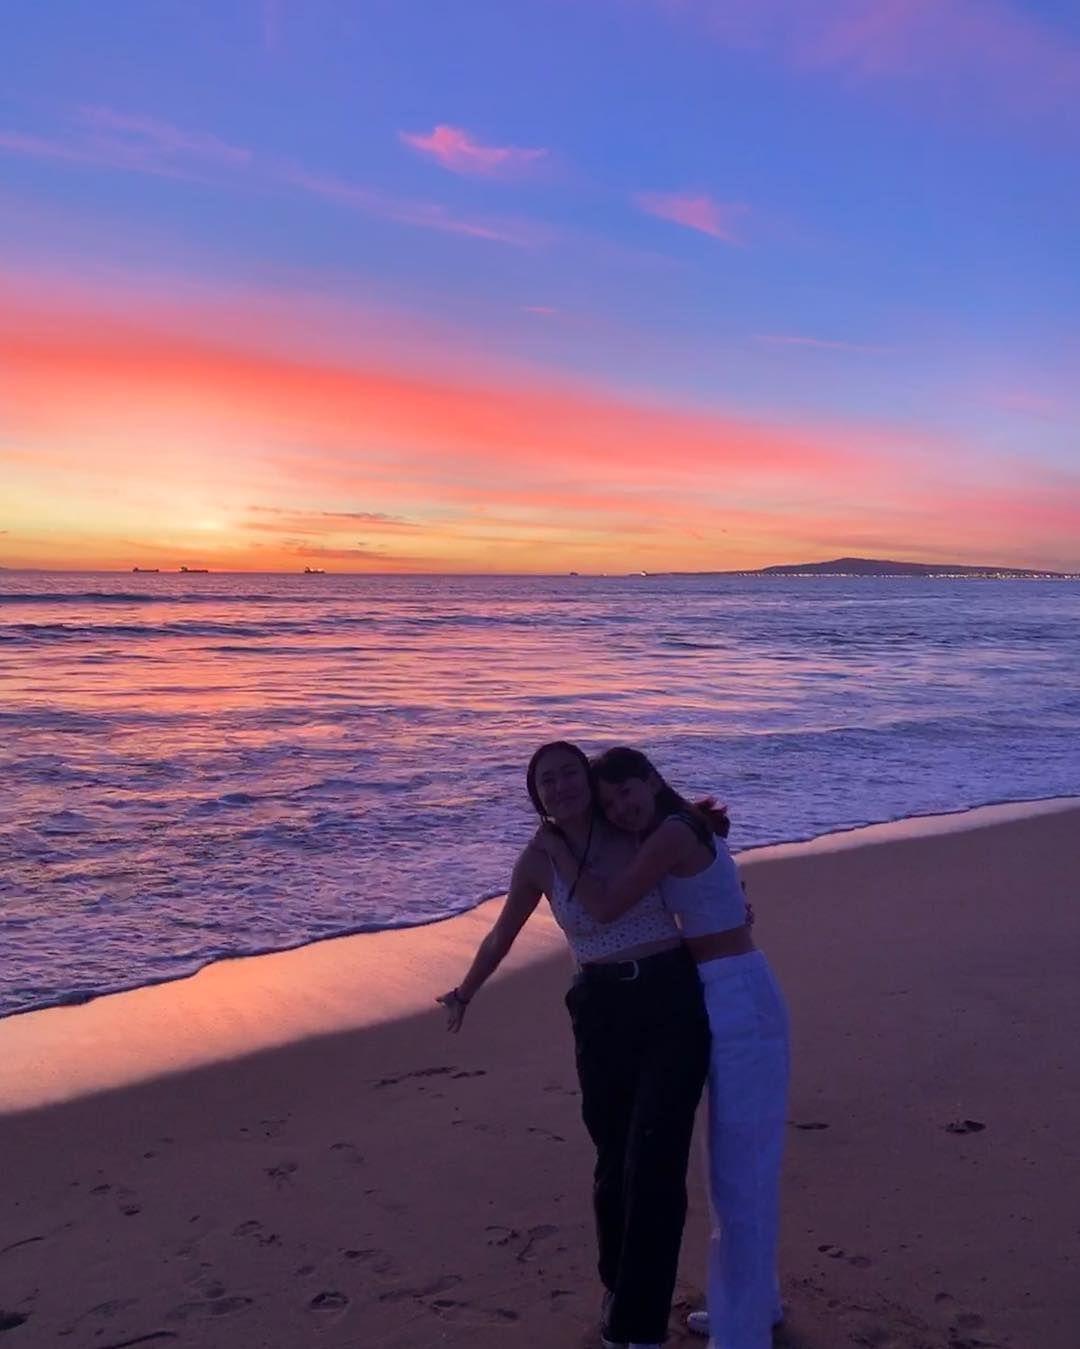 Chloe Hammarstrom On Instagram My Best Friend Sunset Pictures Sunrise Pictures Best Friend Pictures